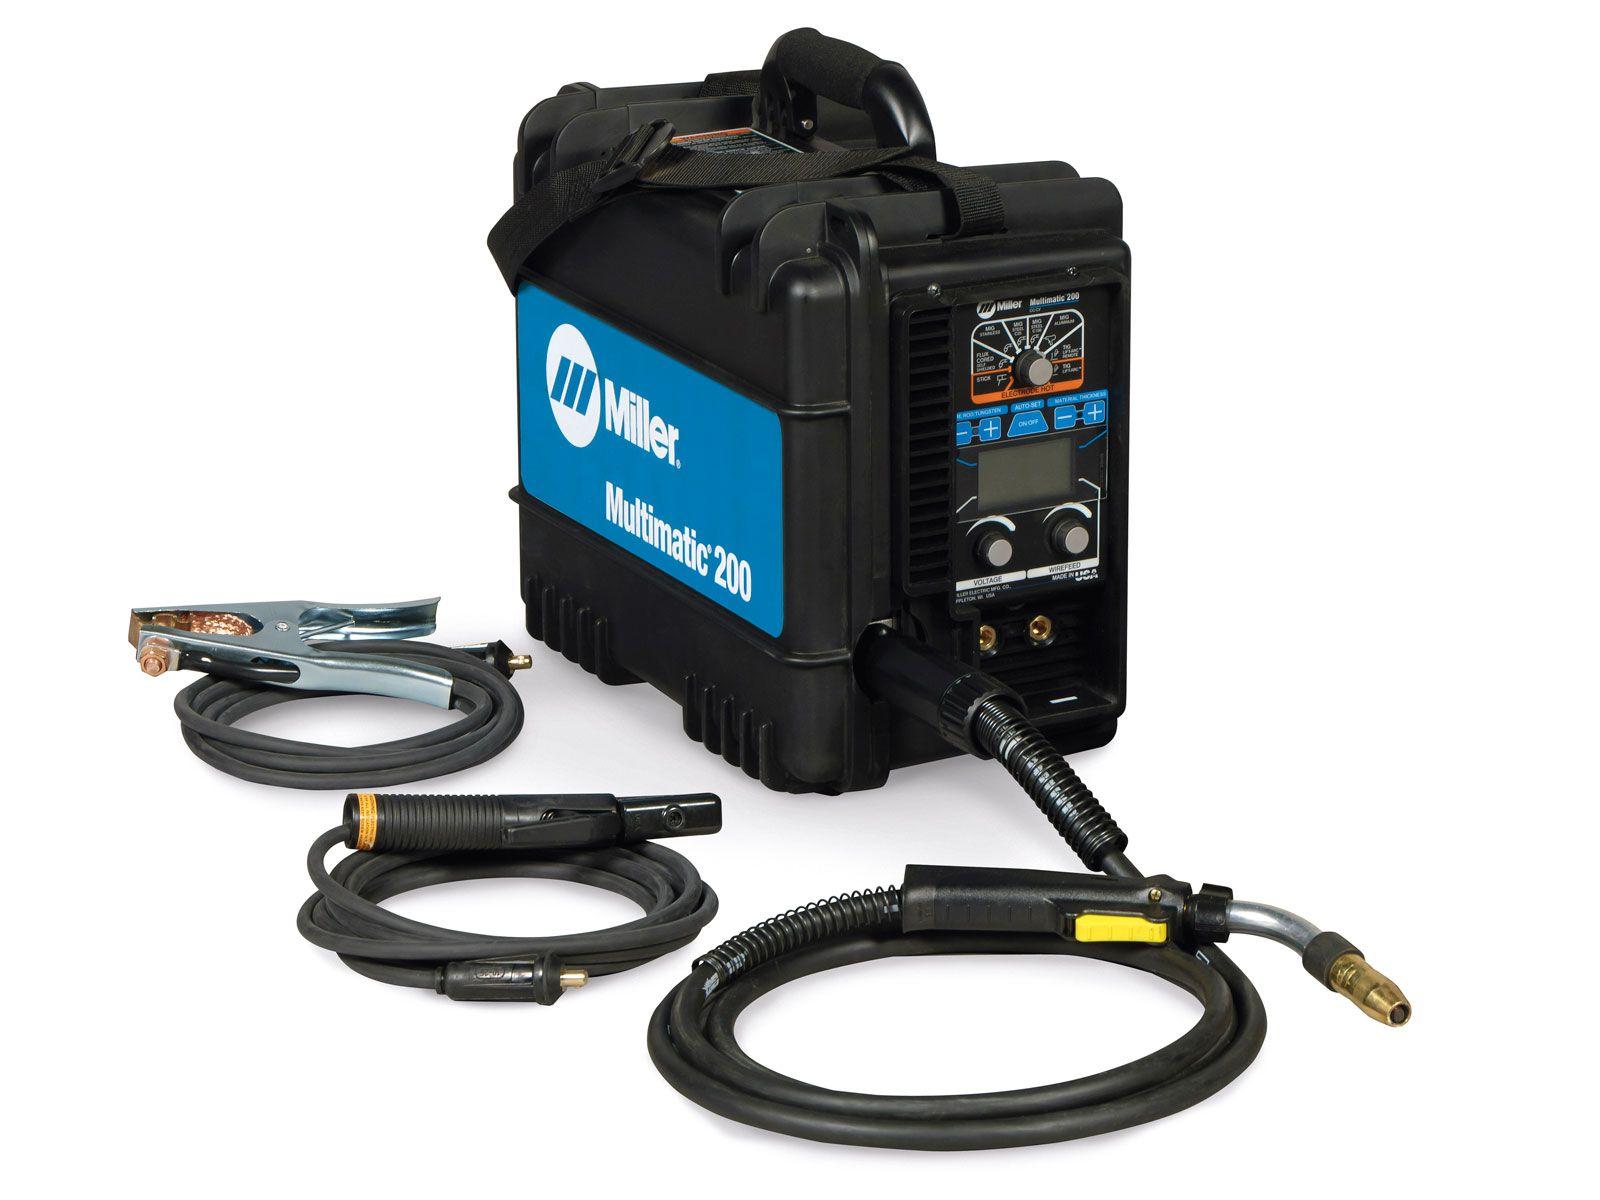 New Multimatic 200 AllinOne Portable Welding System